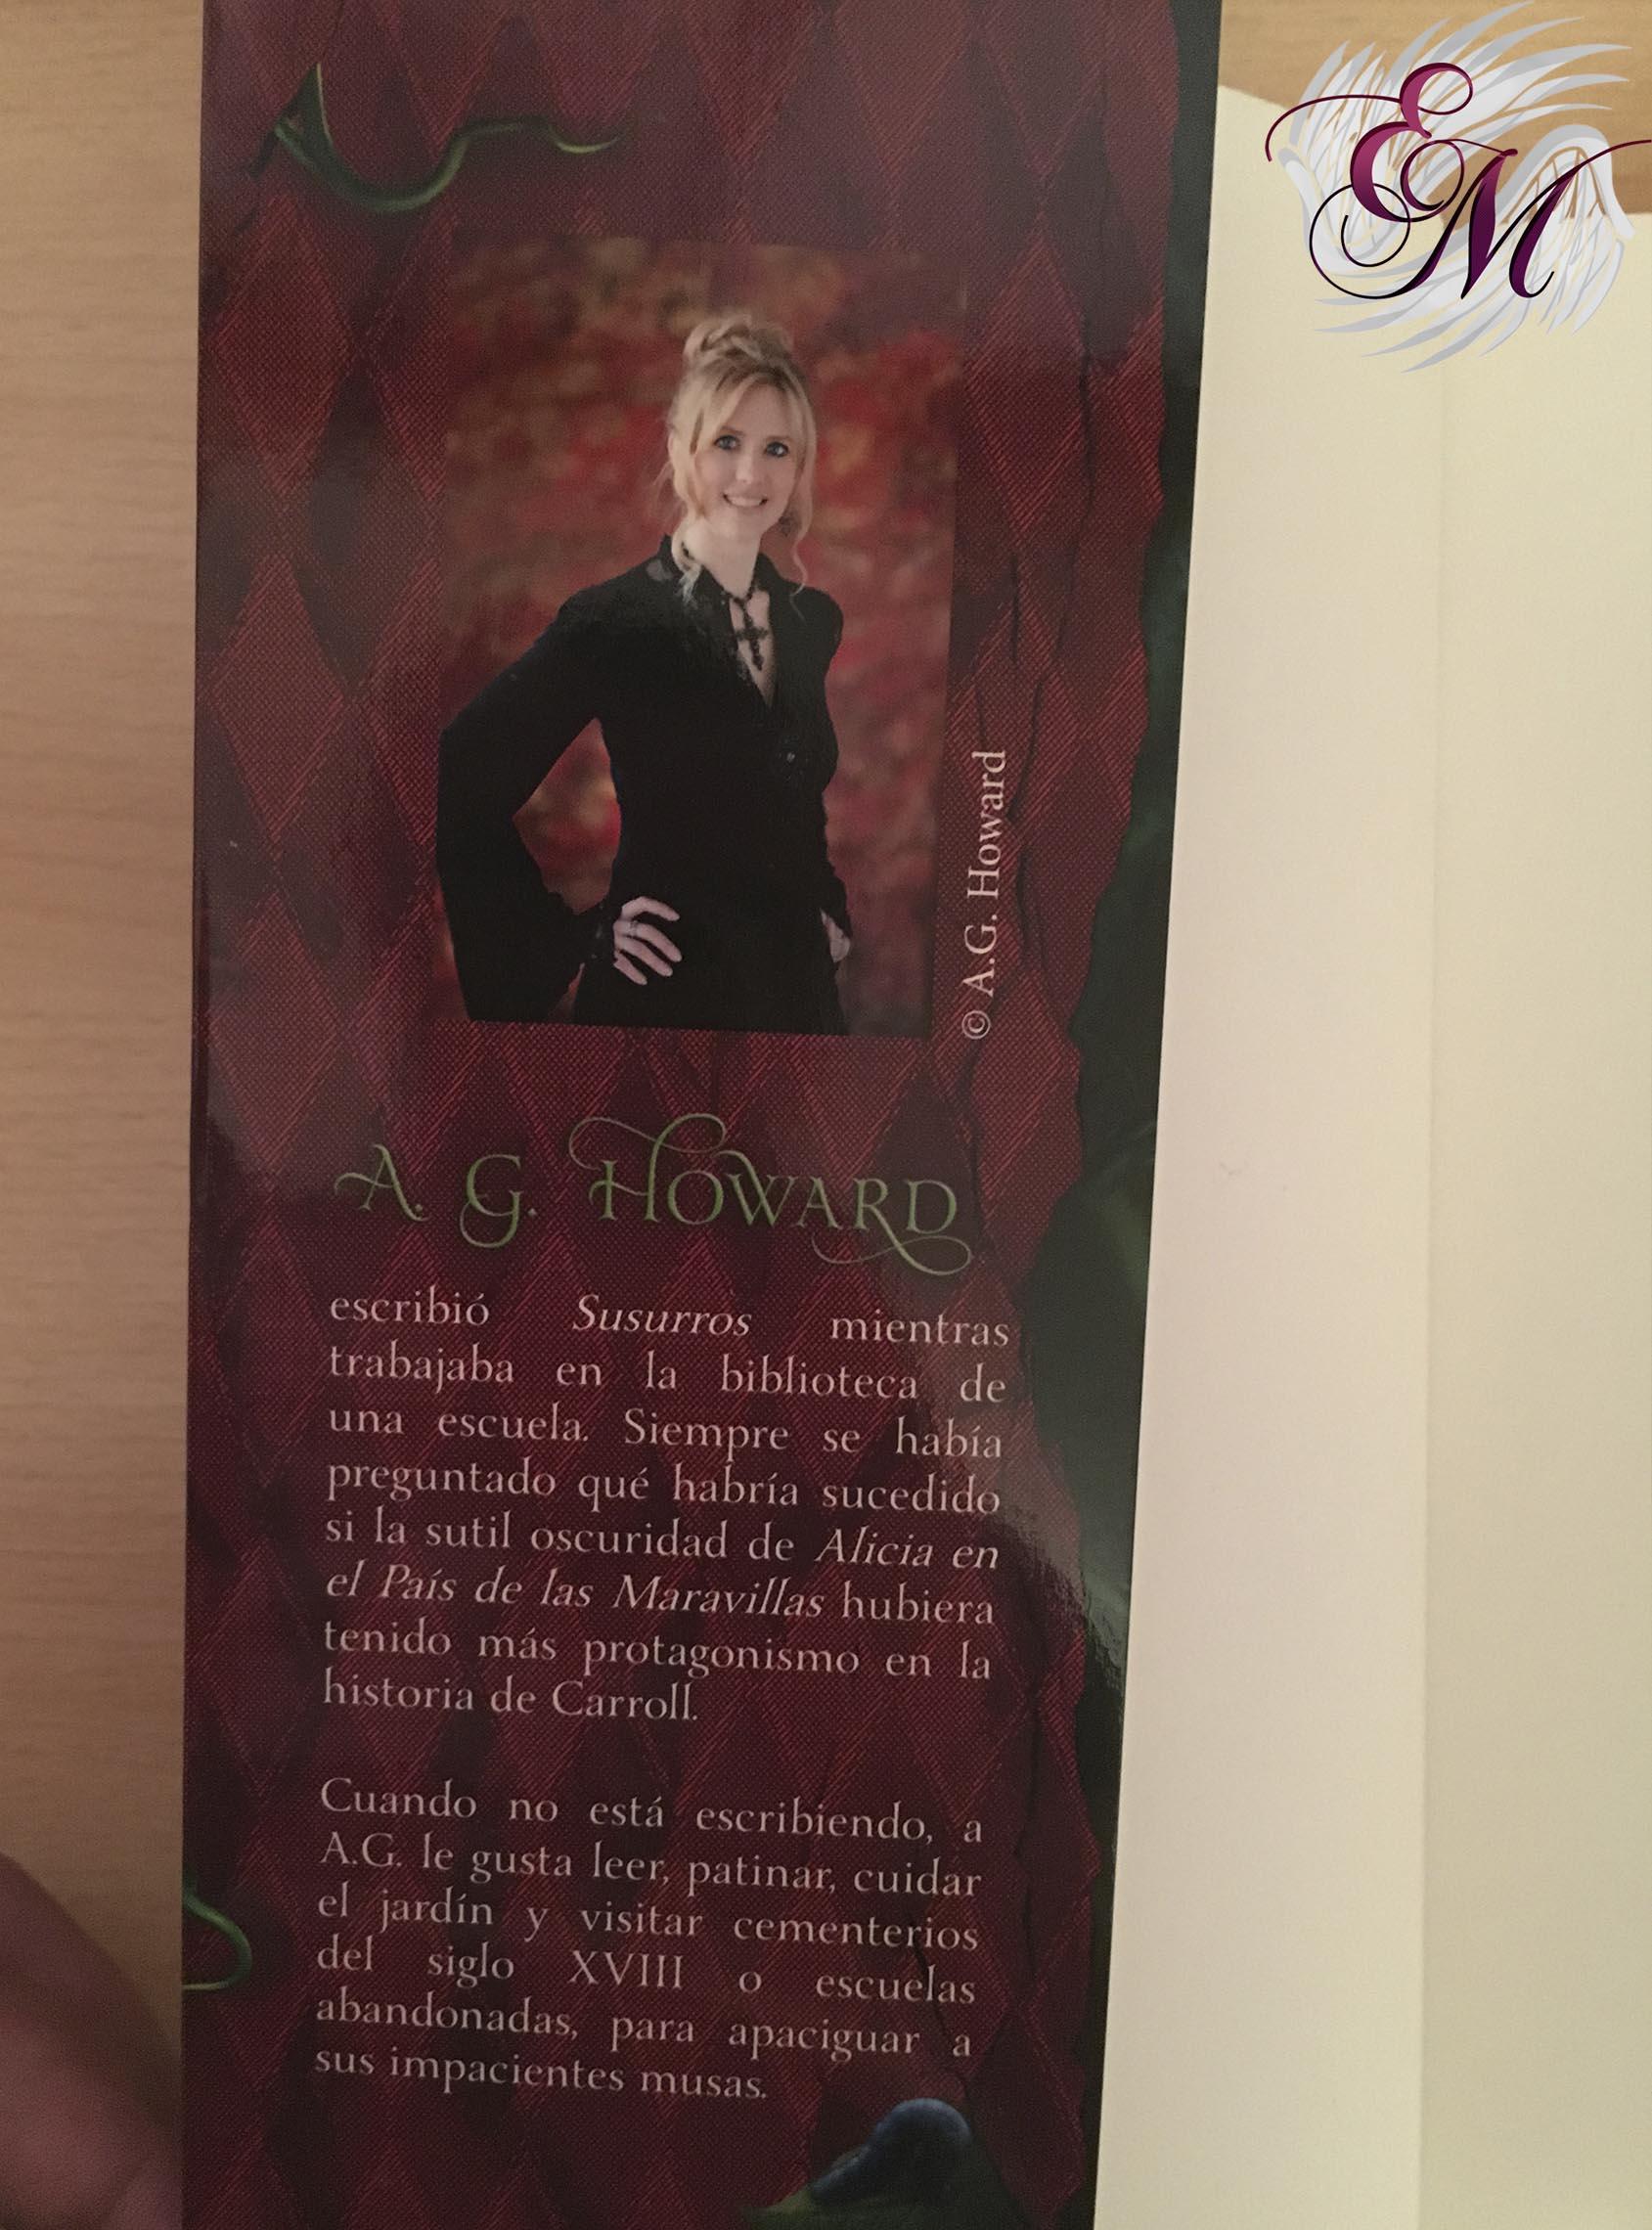 Salvajes de  A.G. Howard - Reseña